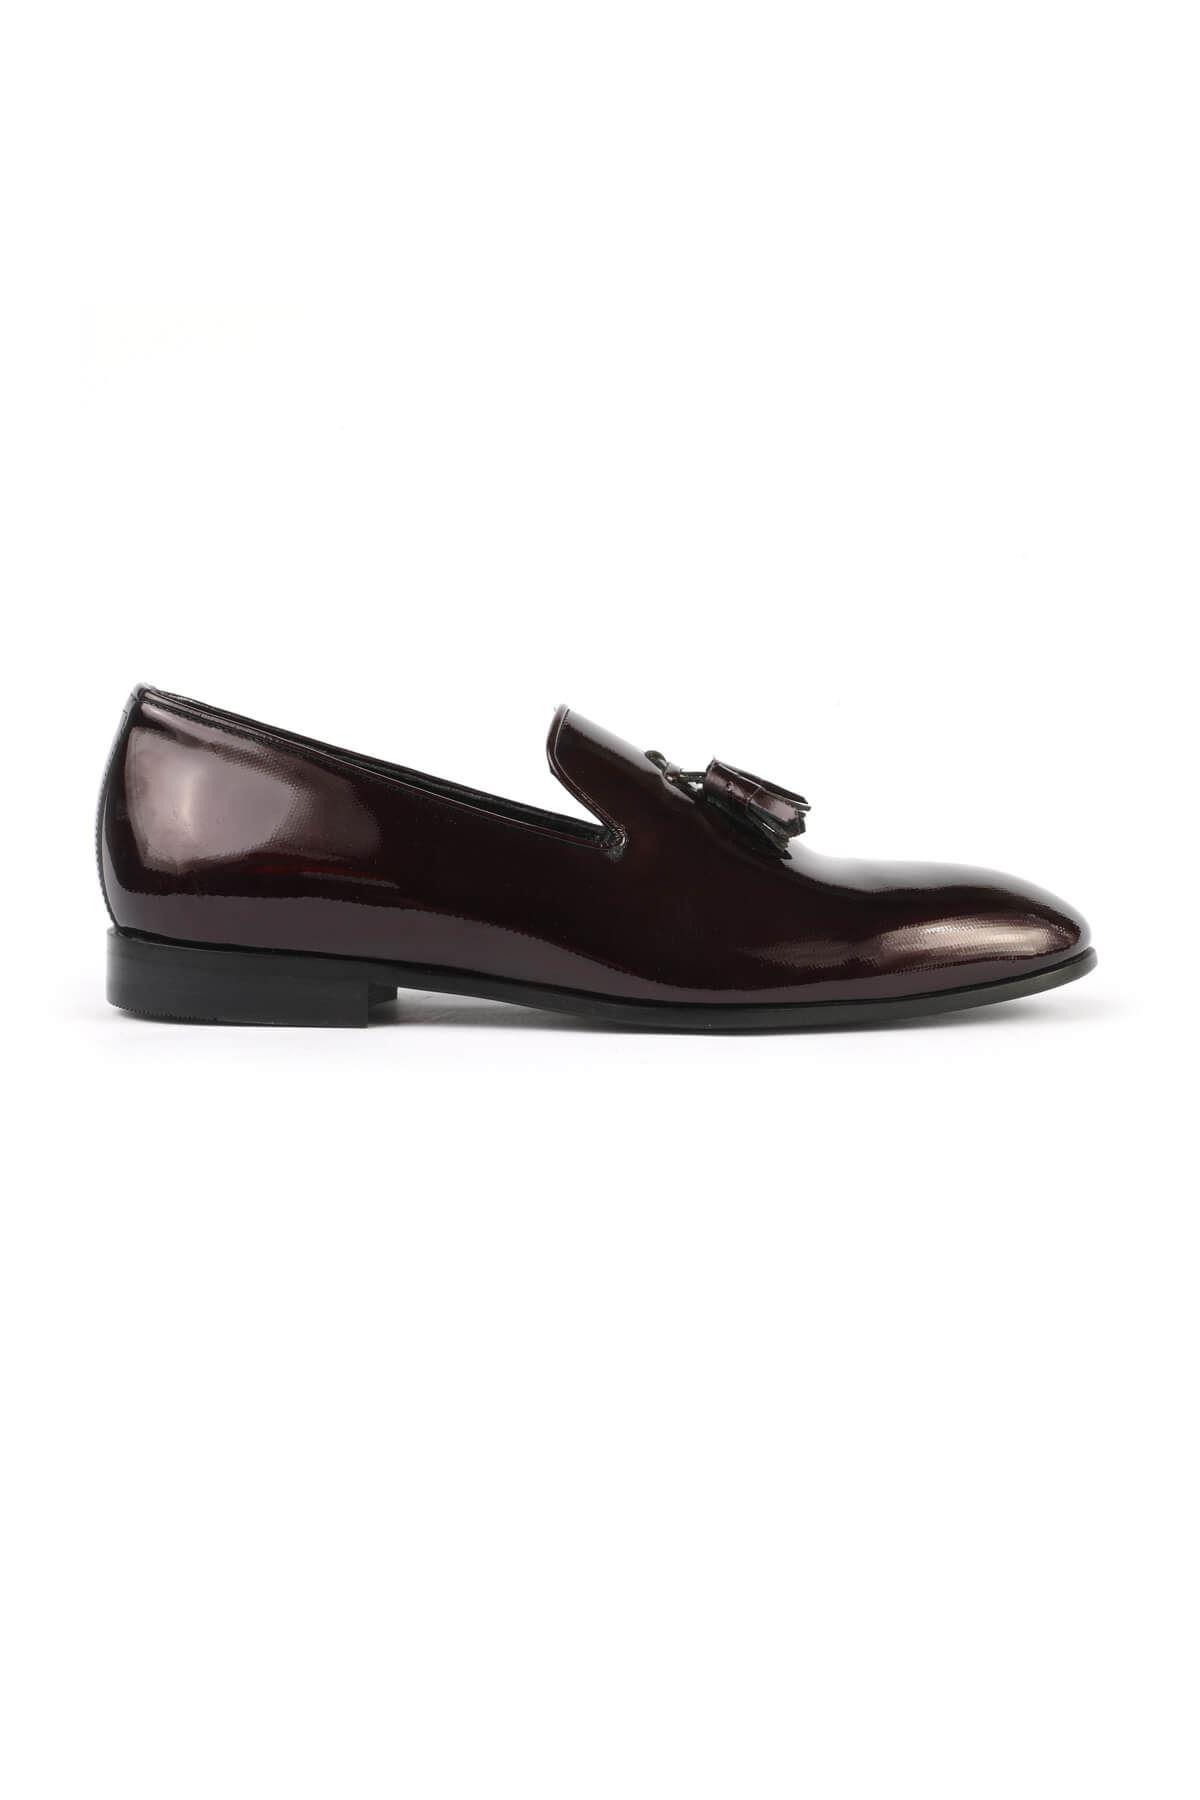 Libero 2393 Claret Red Classic Shoes